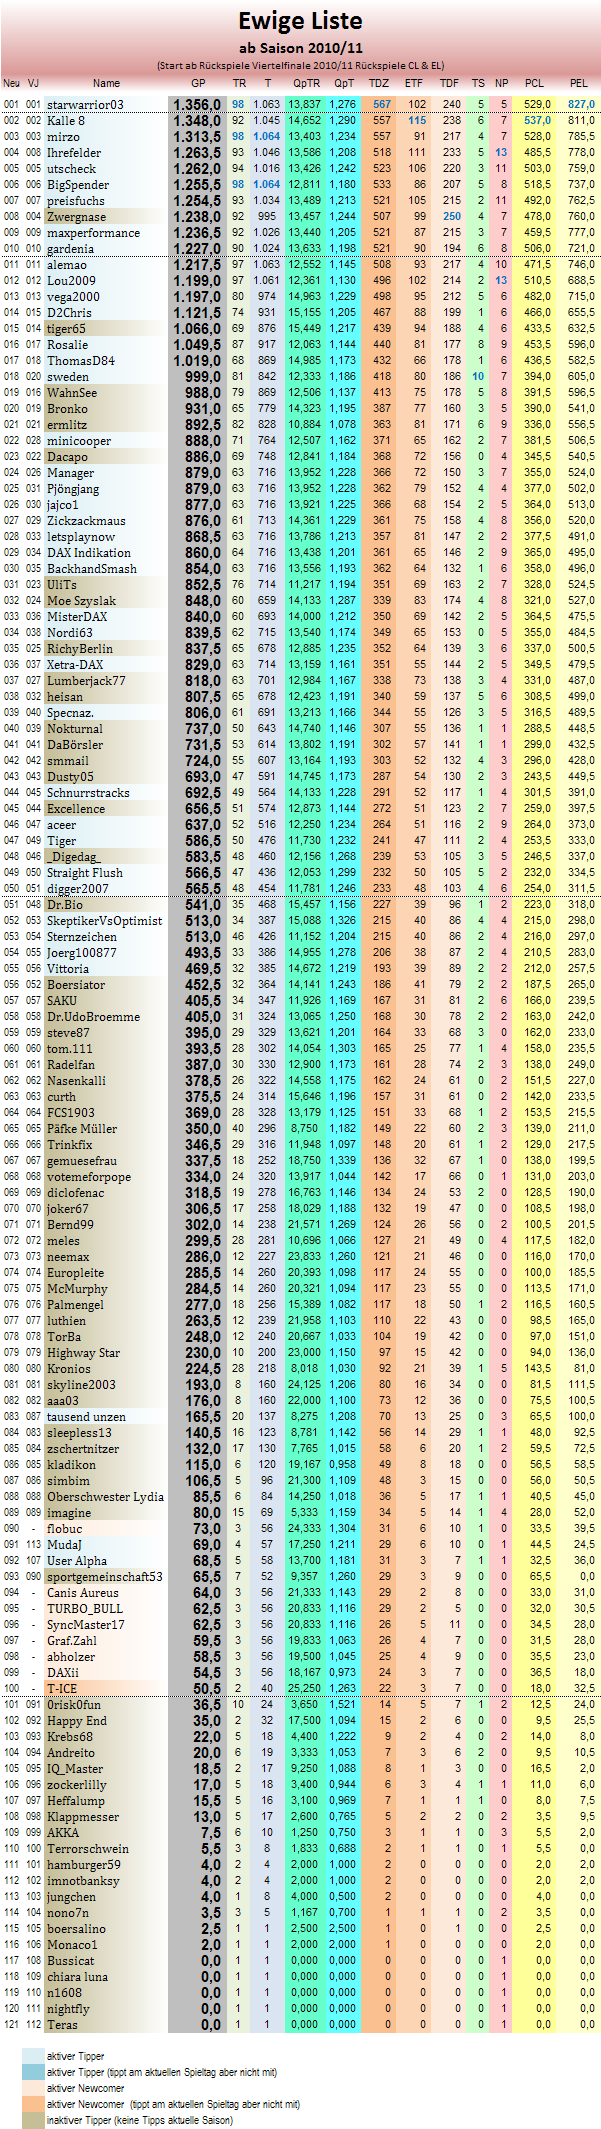 statistikblock_ewige_tabelle.png